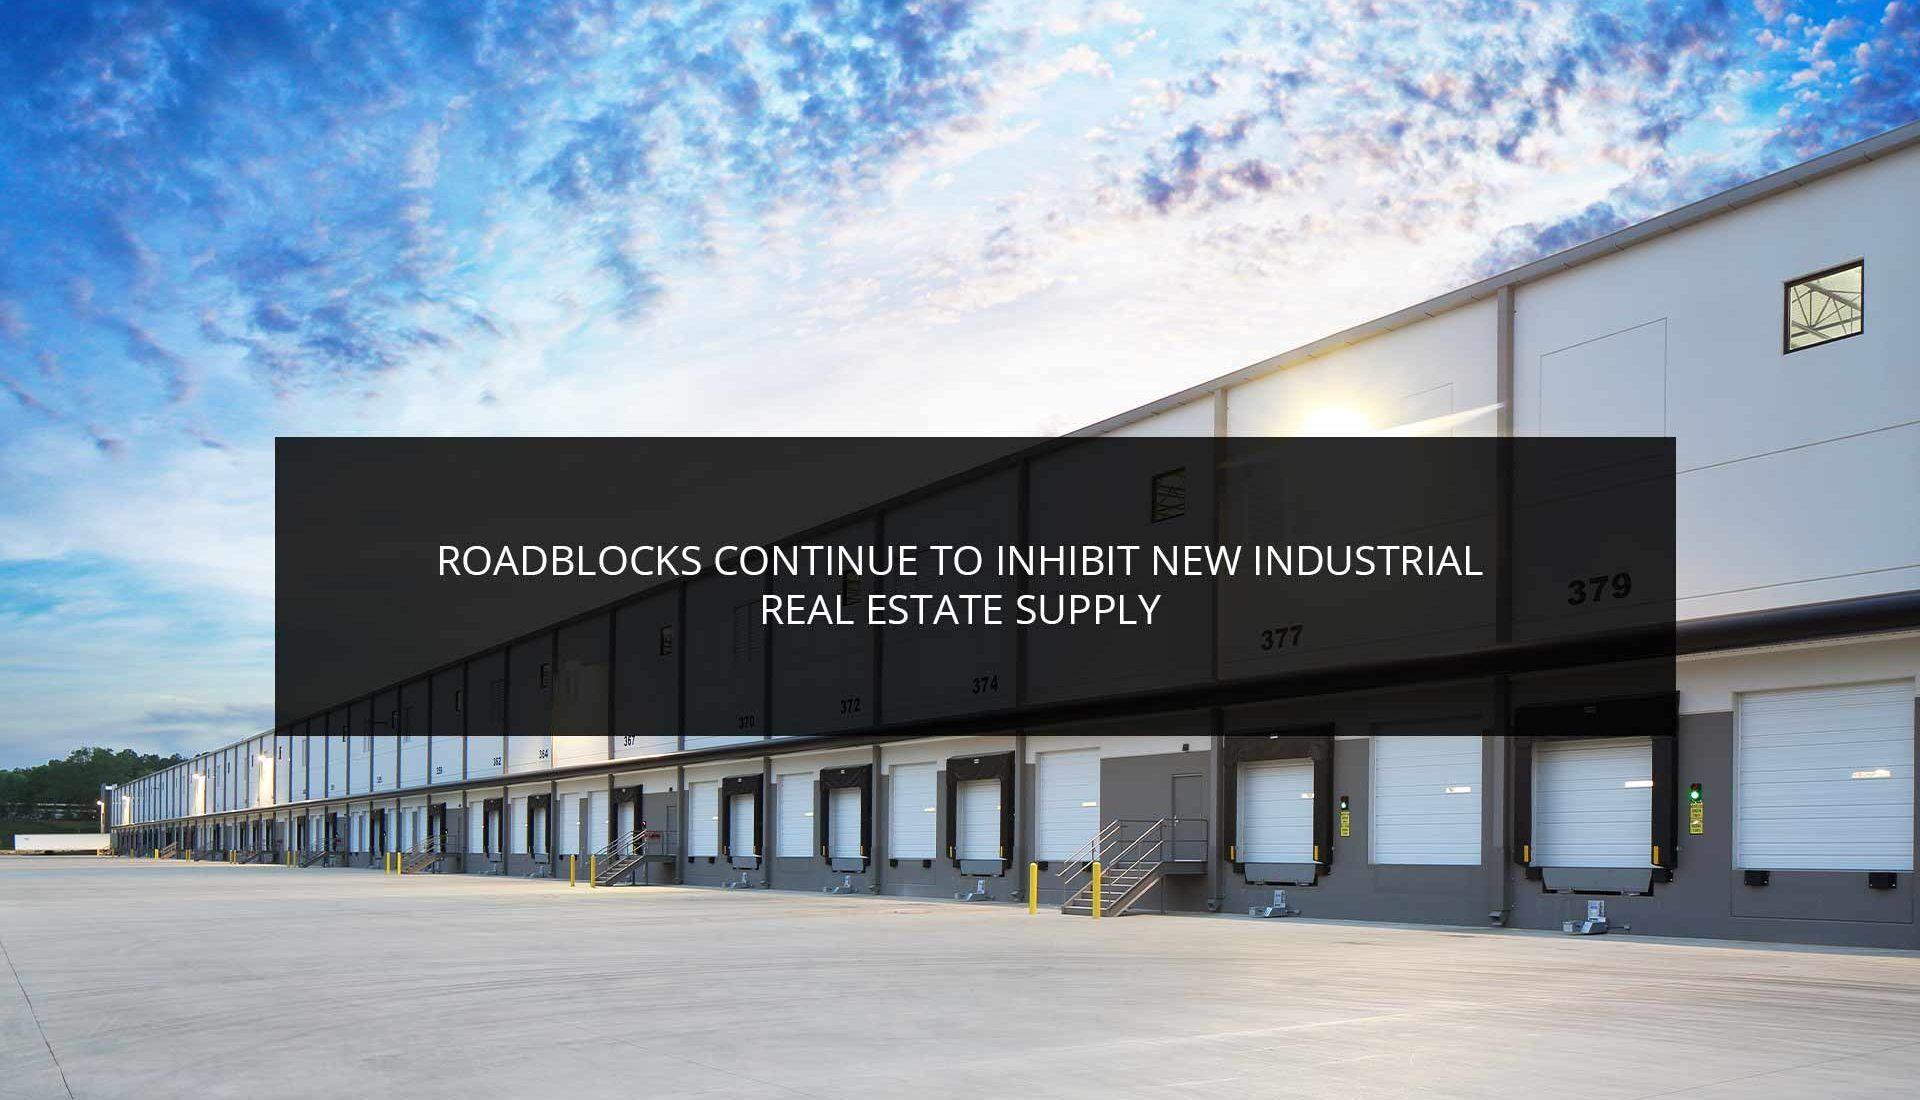 Roadblocks Continue to Inhibit New Industrial Real Estate Supply | Phoenix Investors